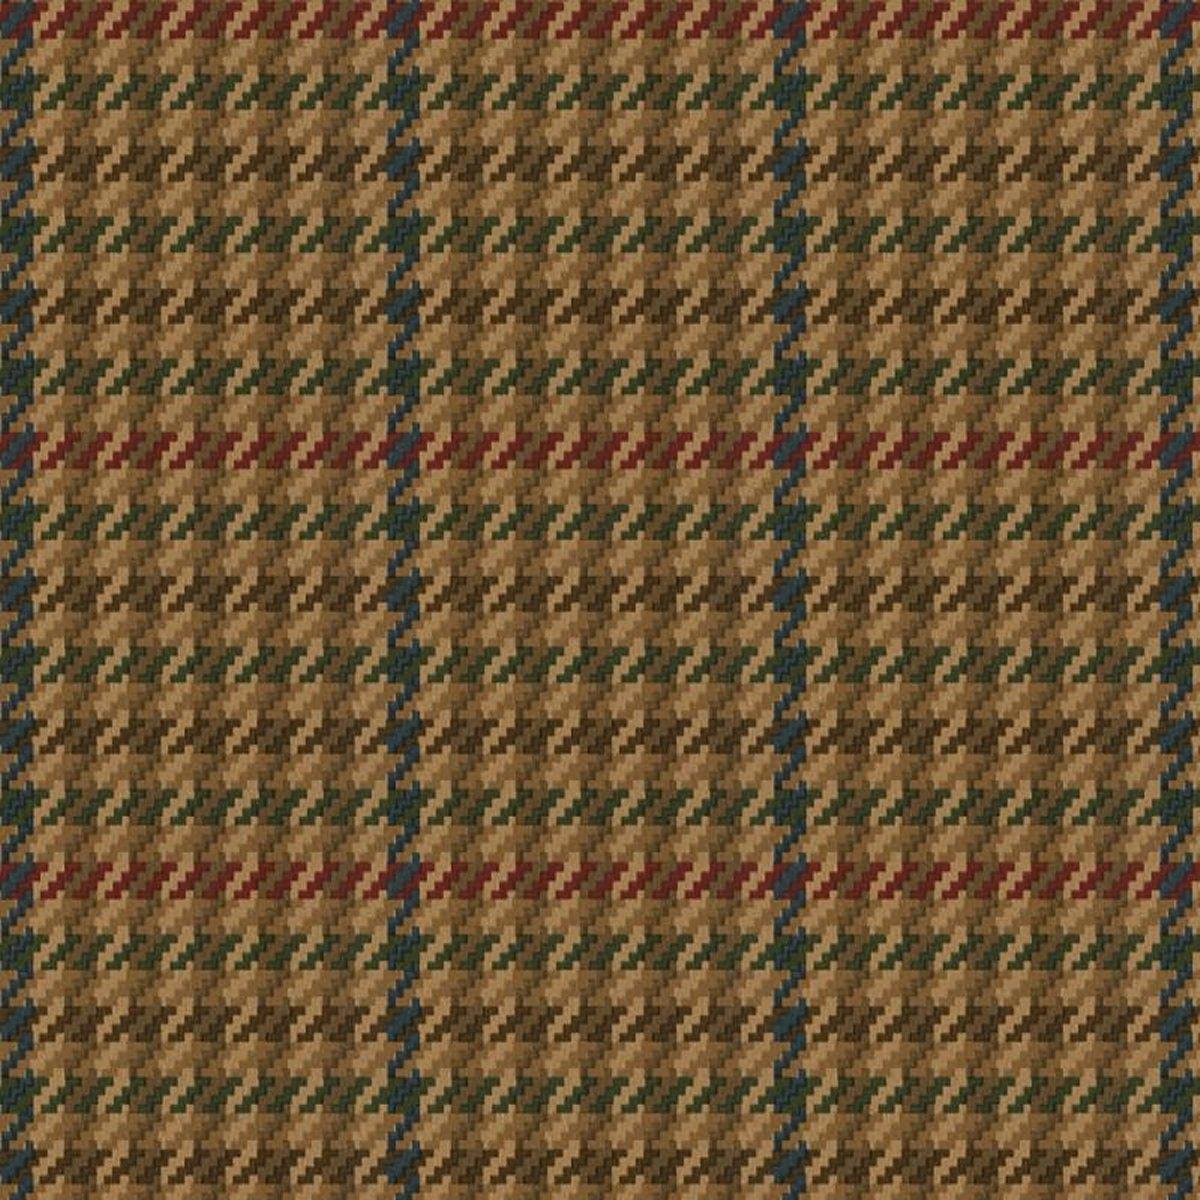 lowes with Tekstur Kertas Wallpaper Garis on Towel Shelves Slim Shelves Towel Rack With Shelf besides 6128958948 further C usproducts moreover Tekstur Kertas Wallpaper Garis besides 535576580670455847.